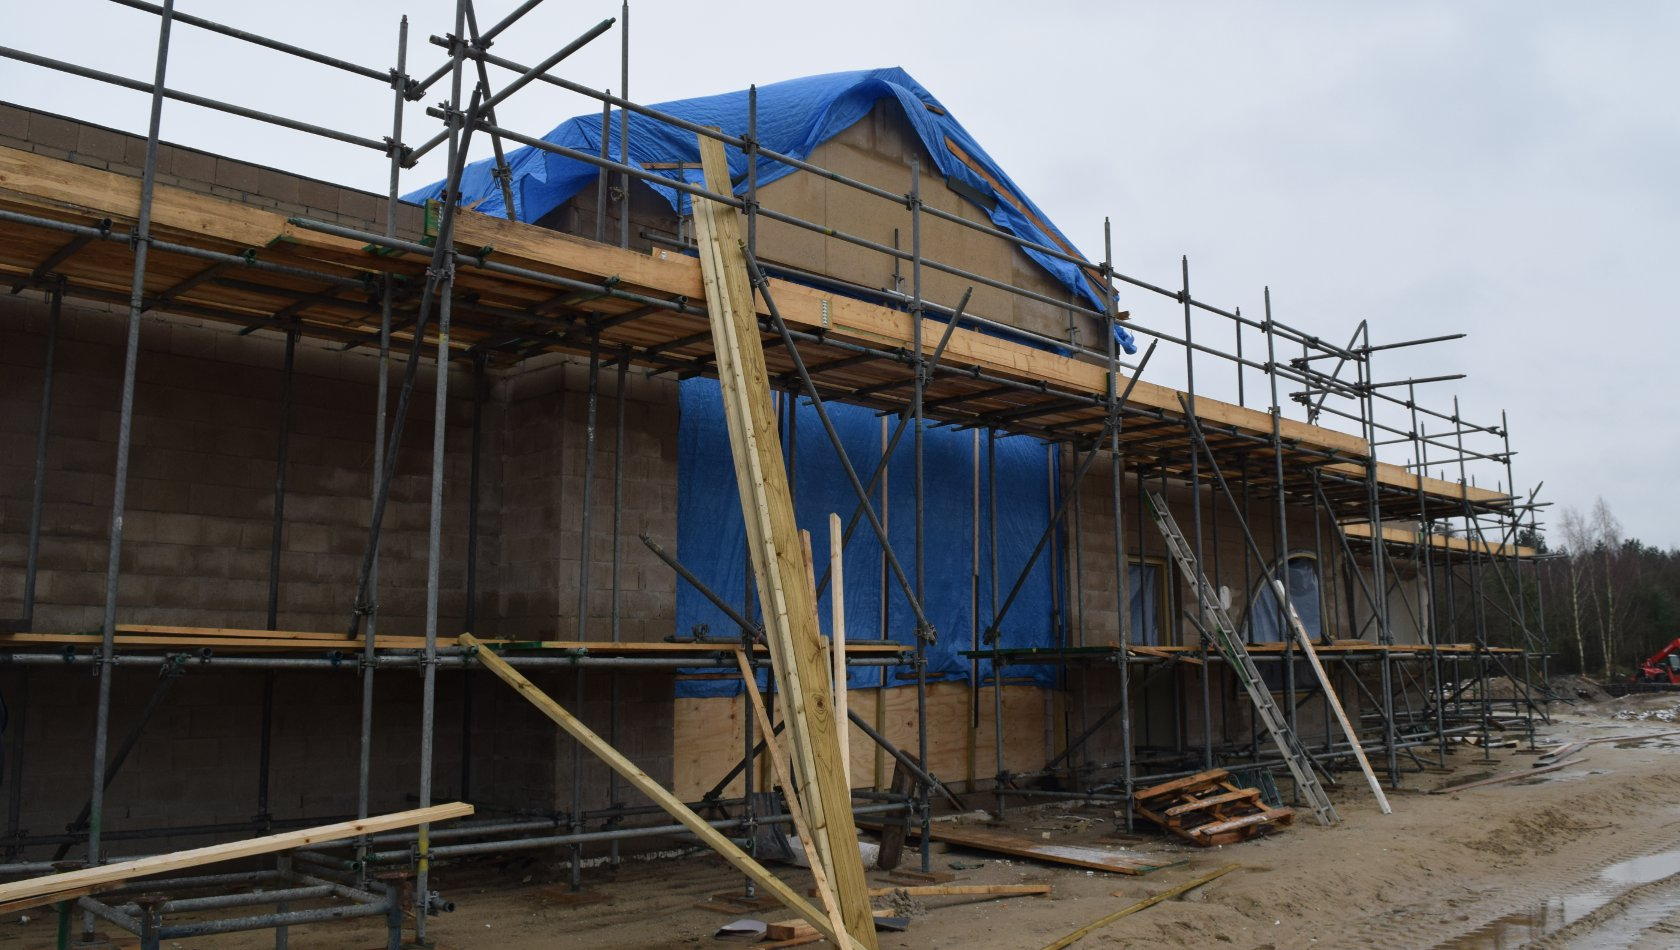 Toverland Baustelle von Avalon (Januar 2018)